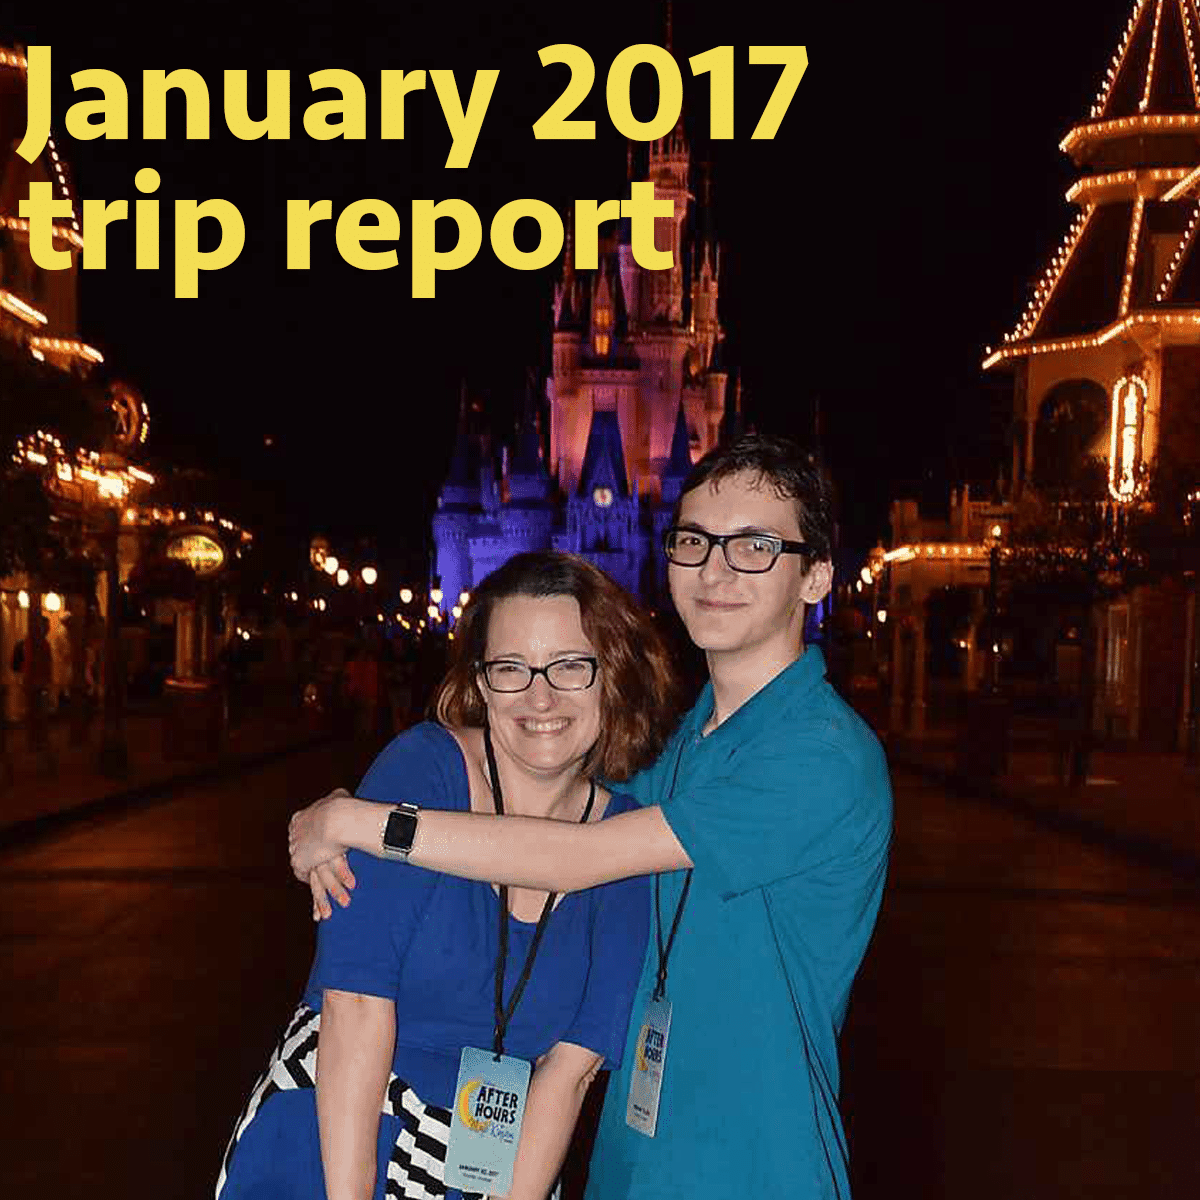 January 2017 Trip report | WDW Prep School